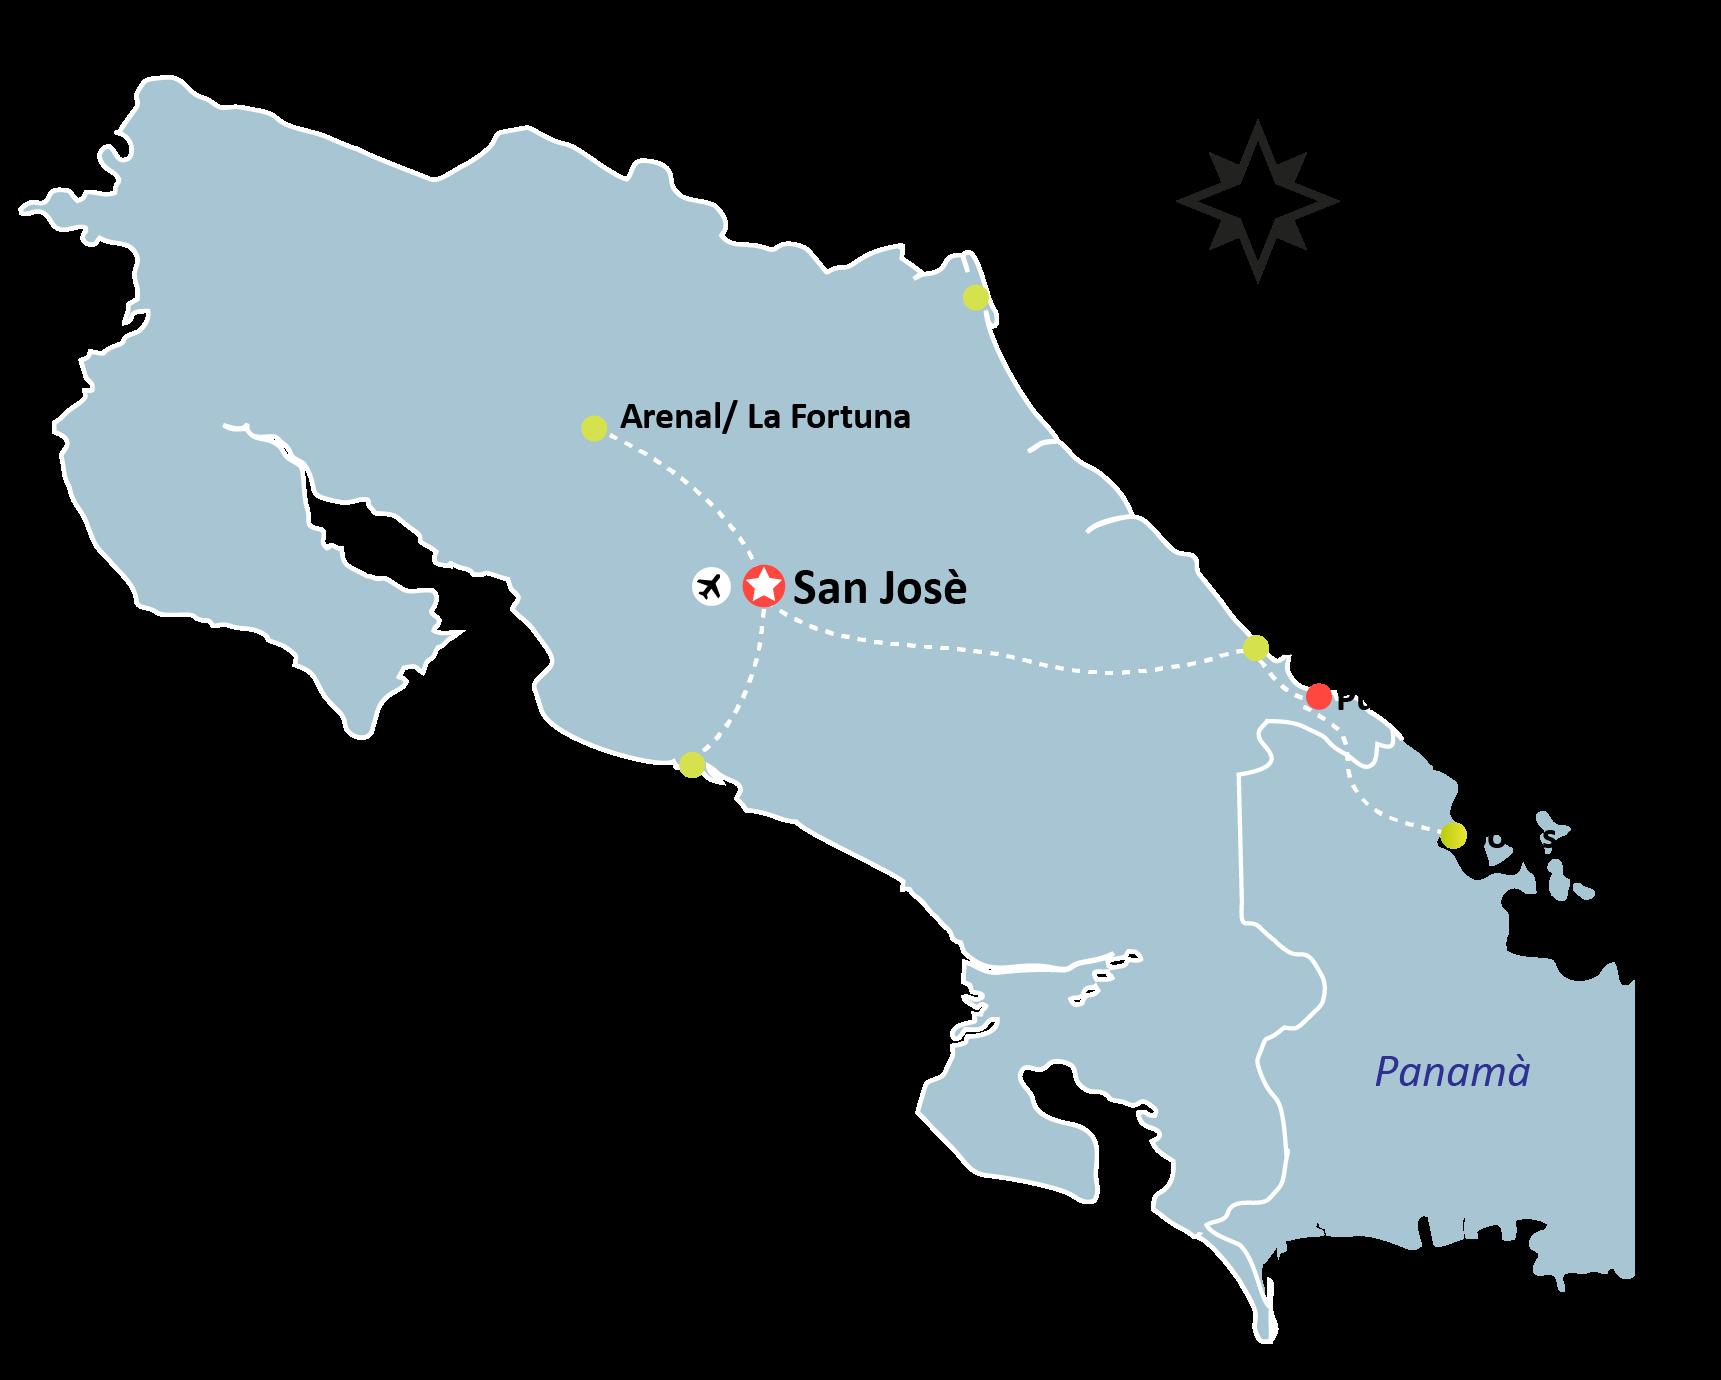 mapa Cruising the Pacific Caribbean 01 - Cruising the Pacific & Caribbean